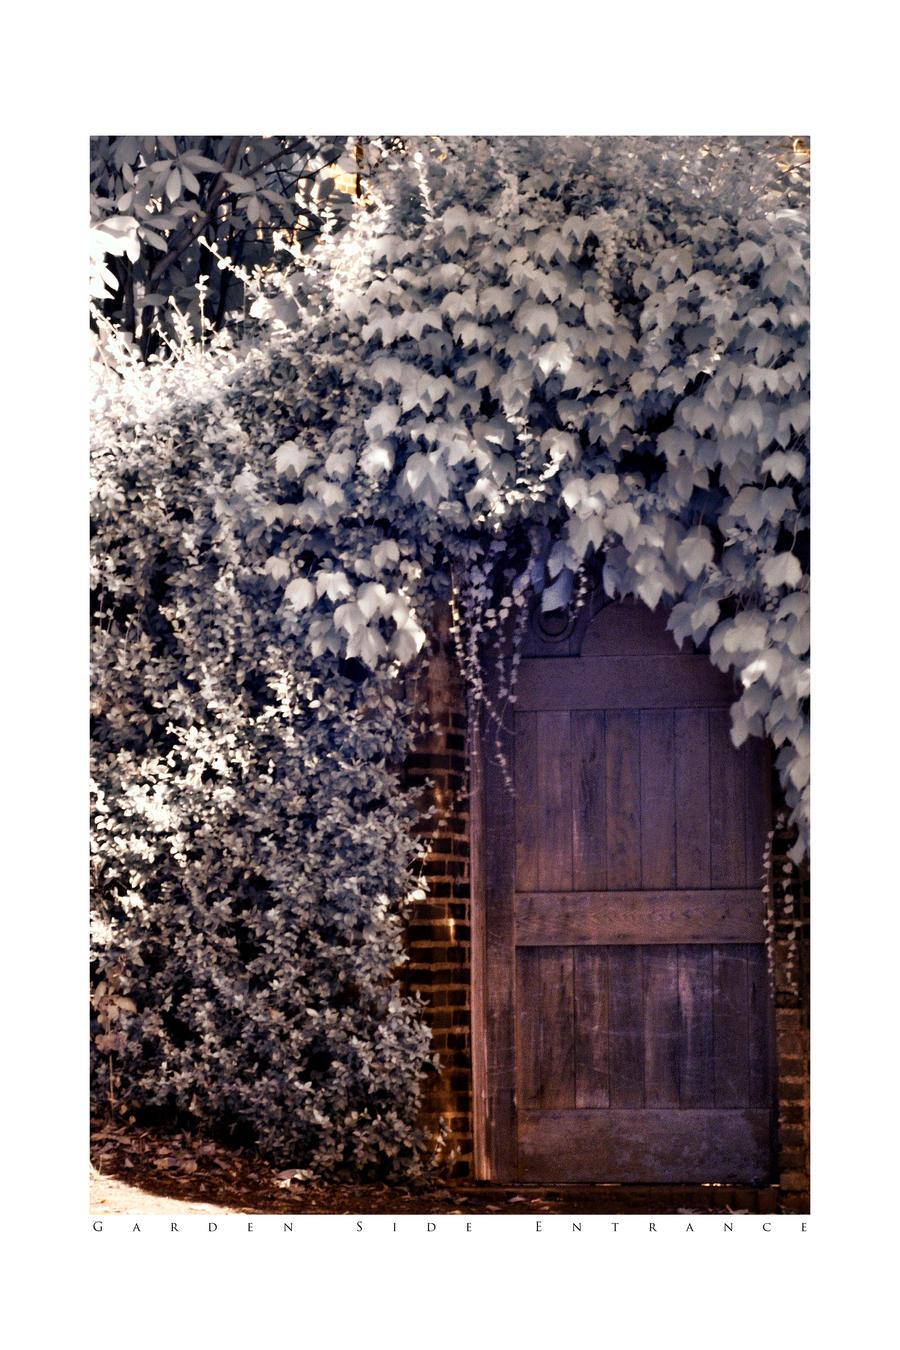 Garden Side Entrance IR HDR by UrbanRural-Photo